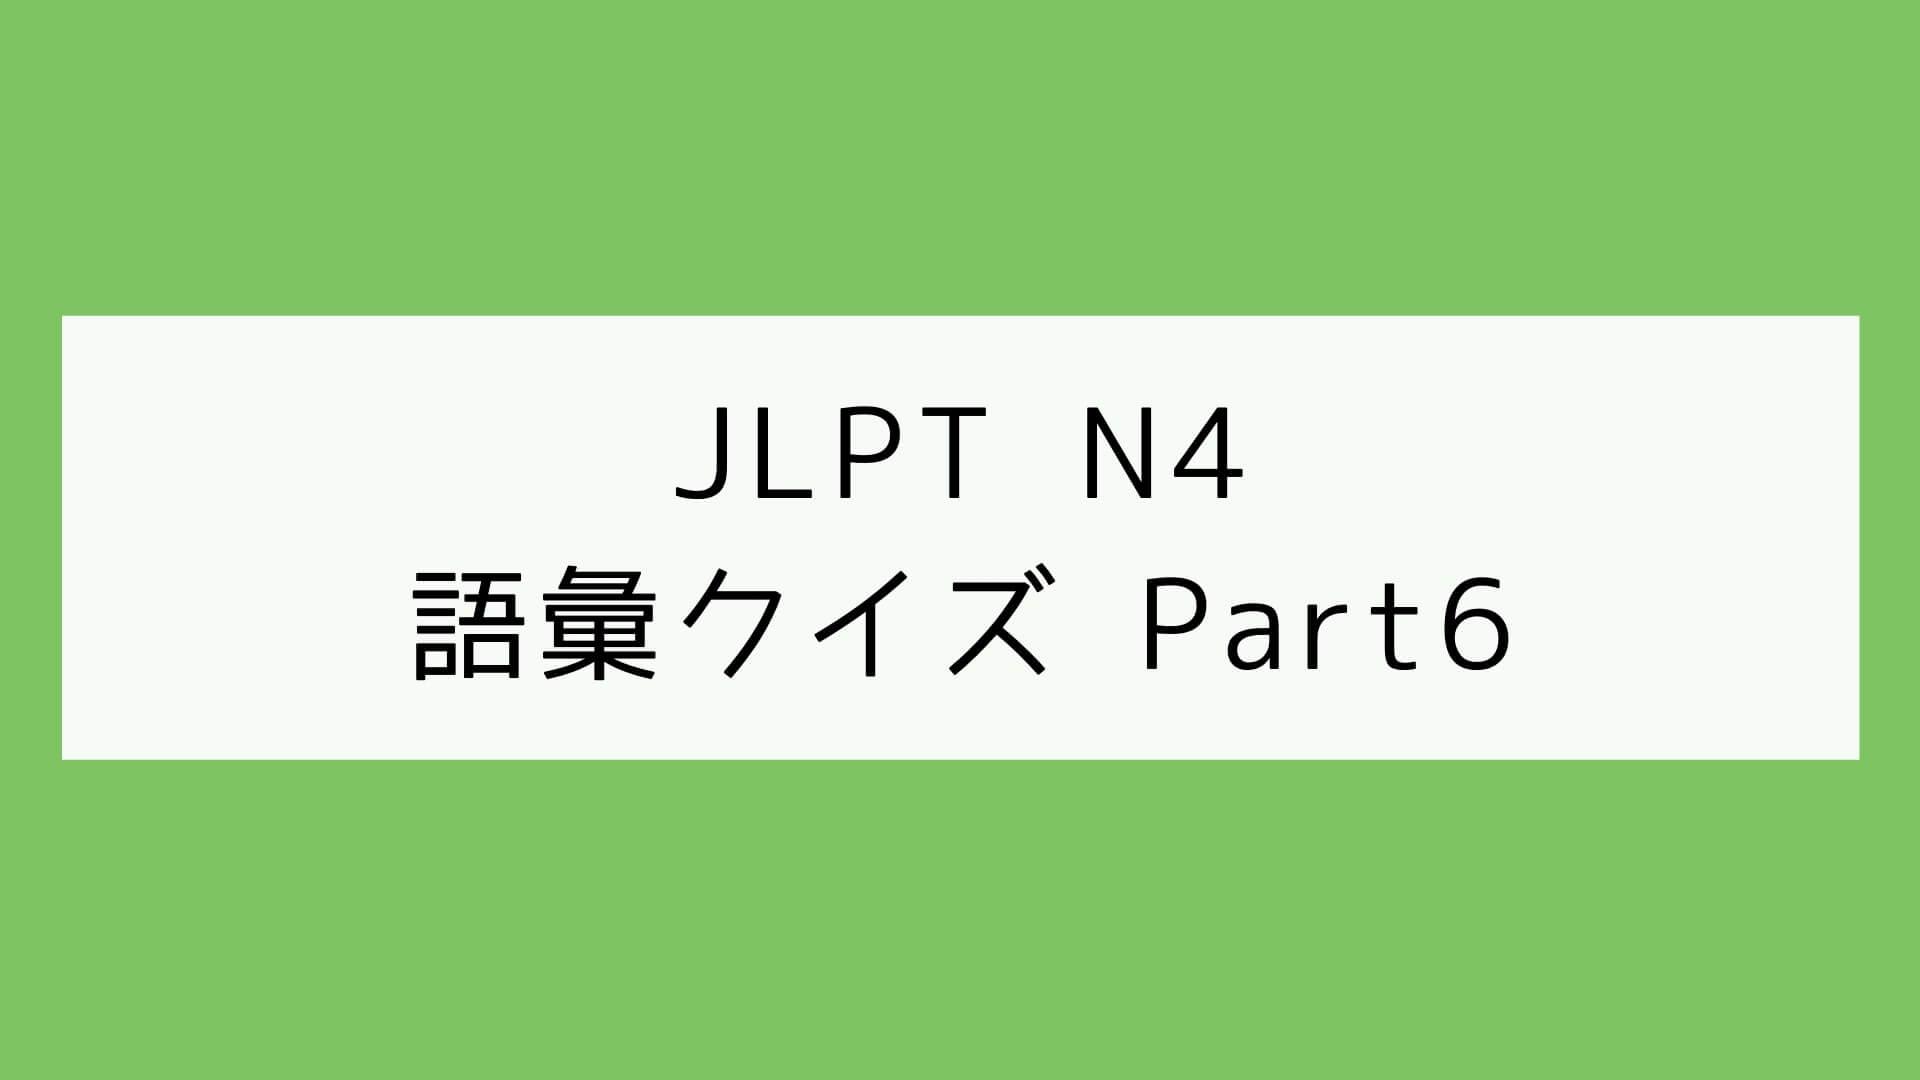 【JLPT N4】語彙クイズ Part6